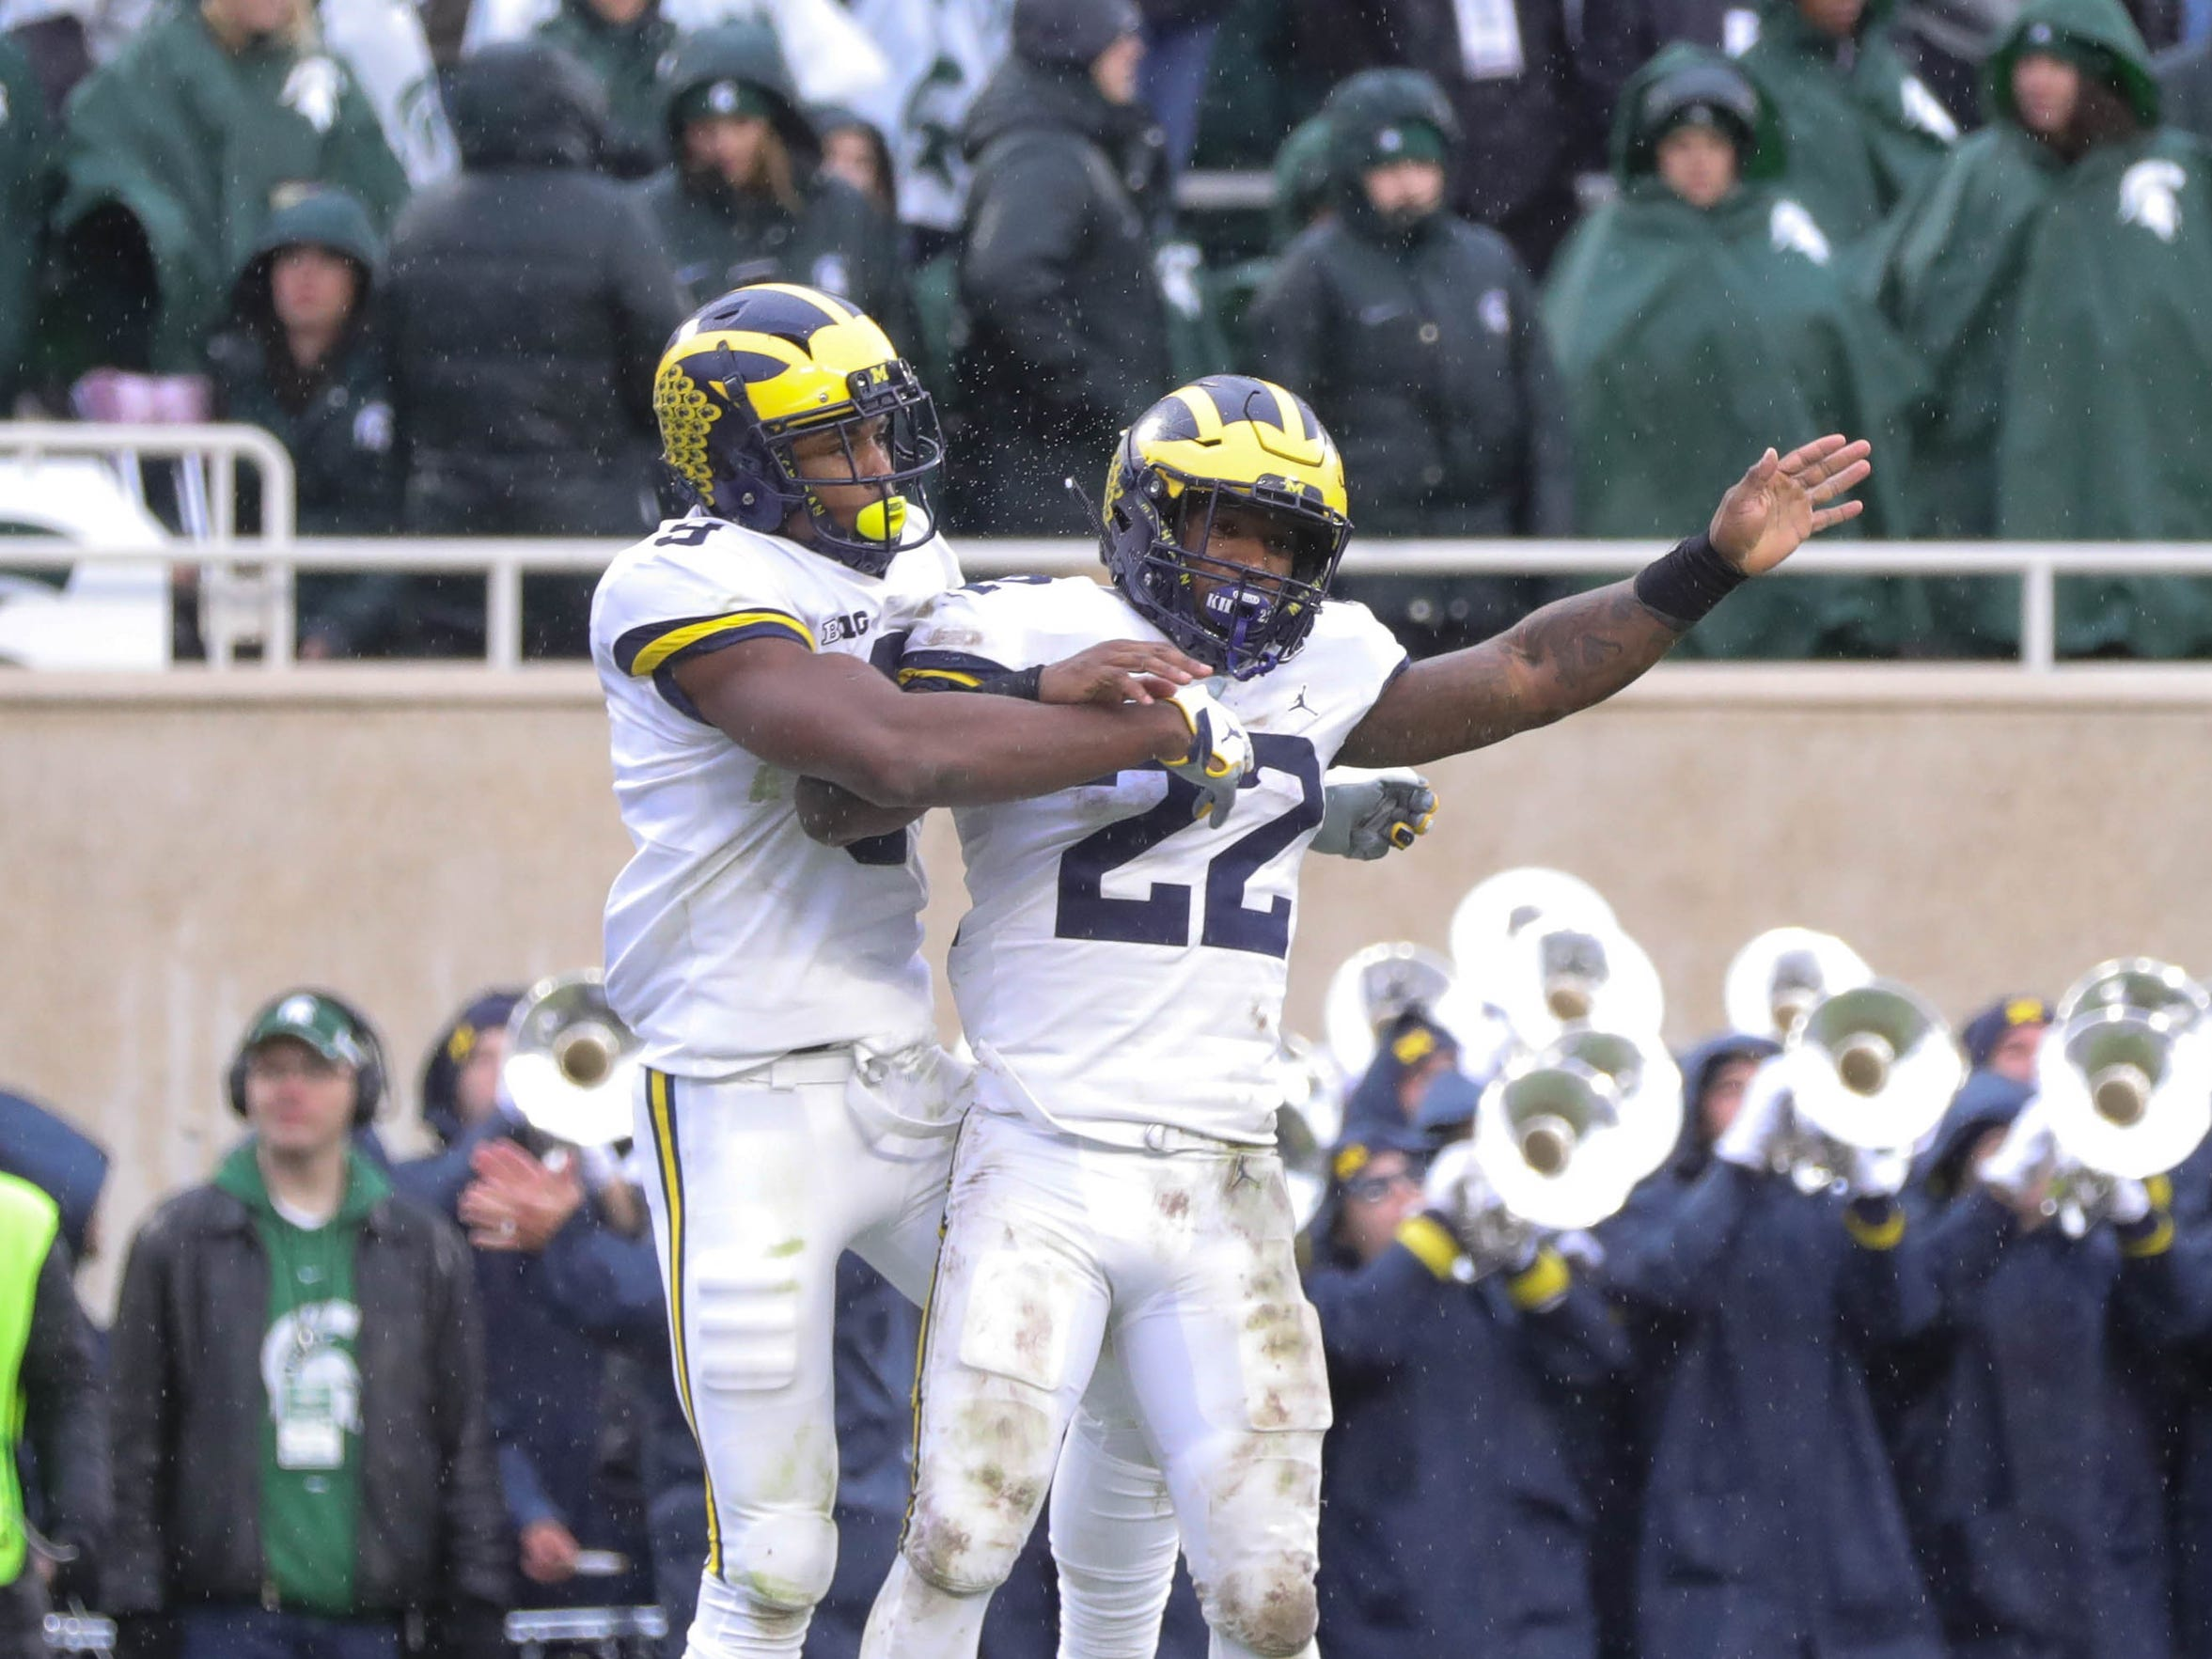 Michigan's Donovan Peoples-Jones (9) and Karan Higdon (22) celebrate Peoples-Jones' go-ahead touchdown against Michigan State in the third quarter Saturday, Oct. 20, 2018 at Spartan Stadium in East Lansing.